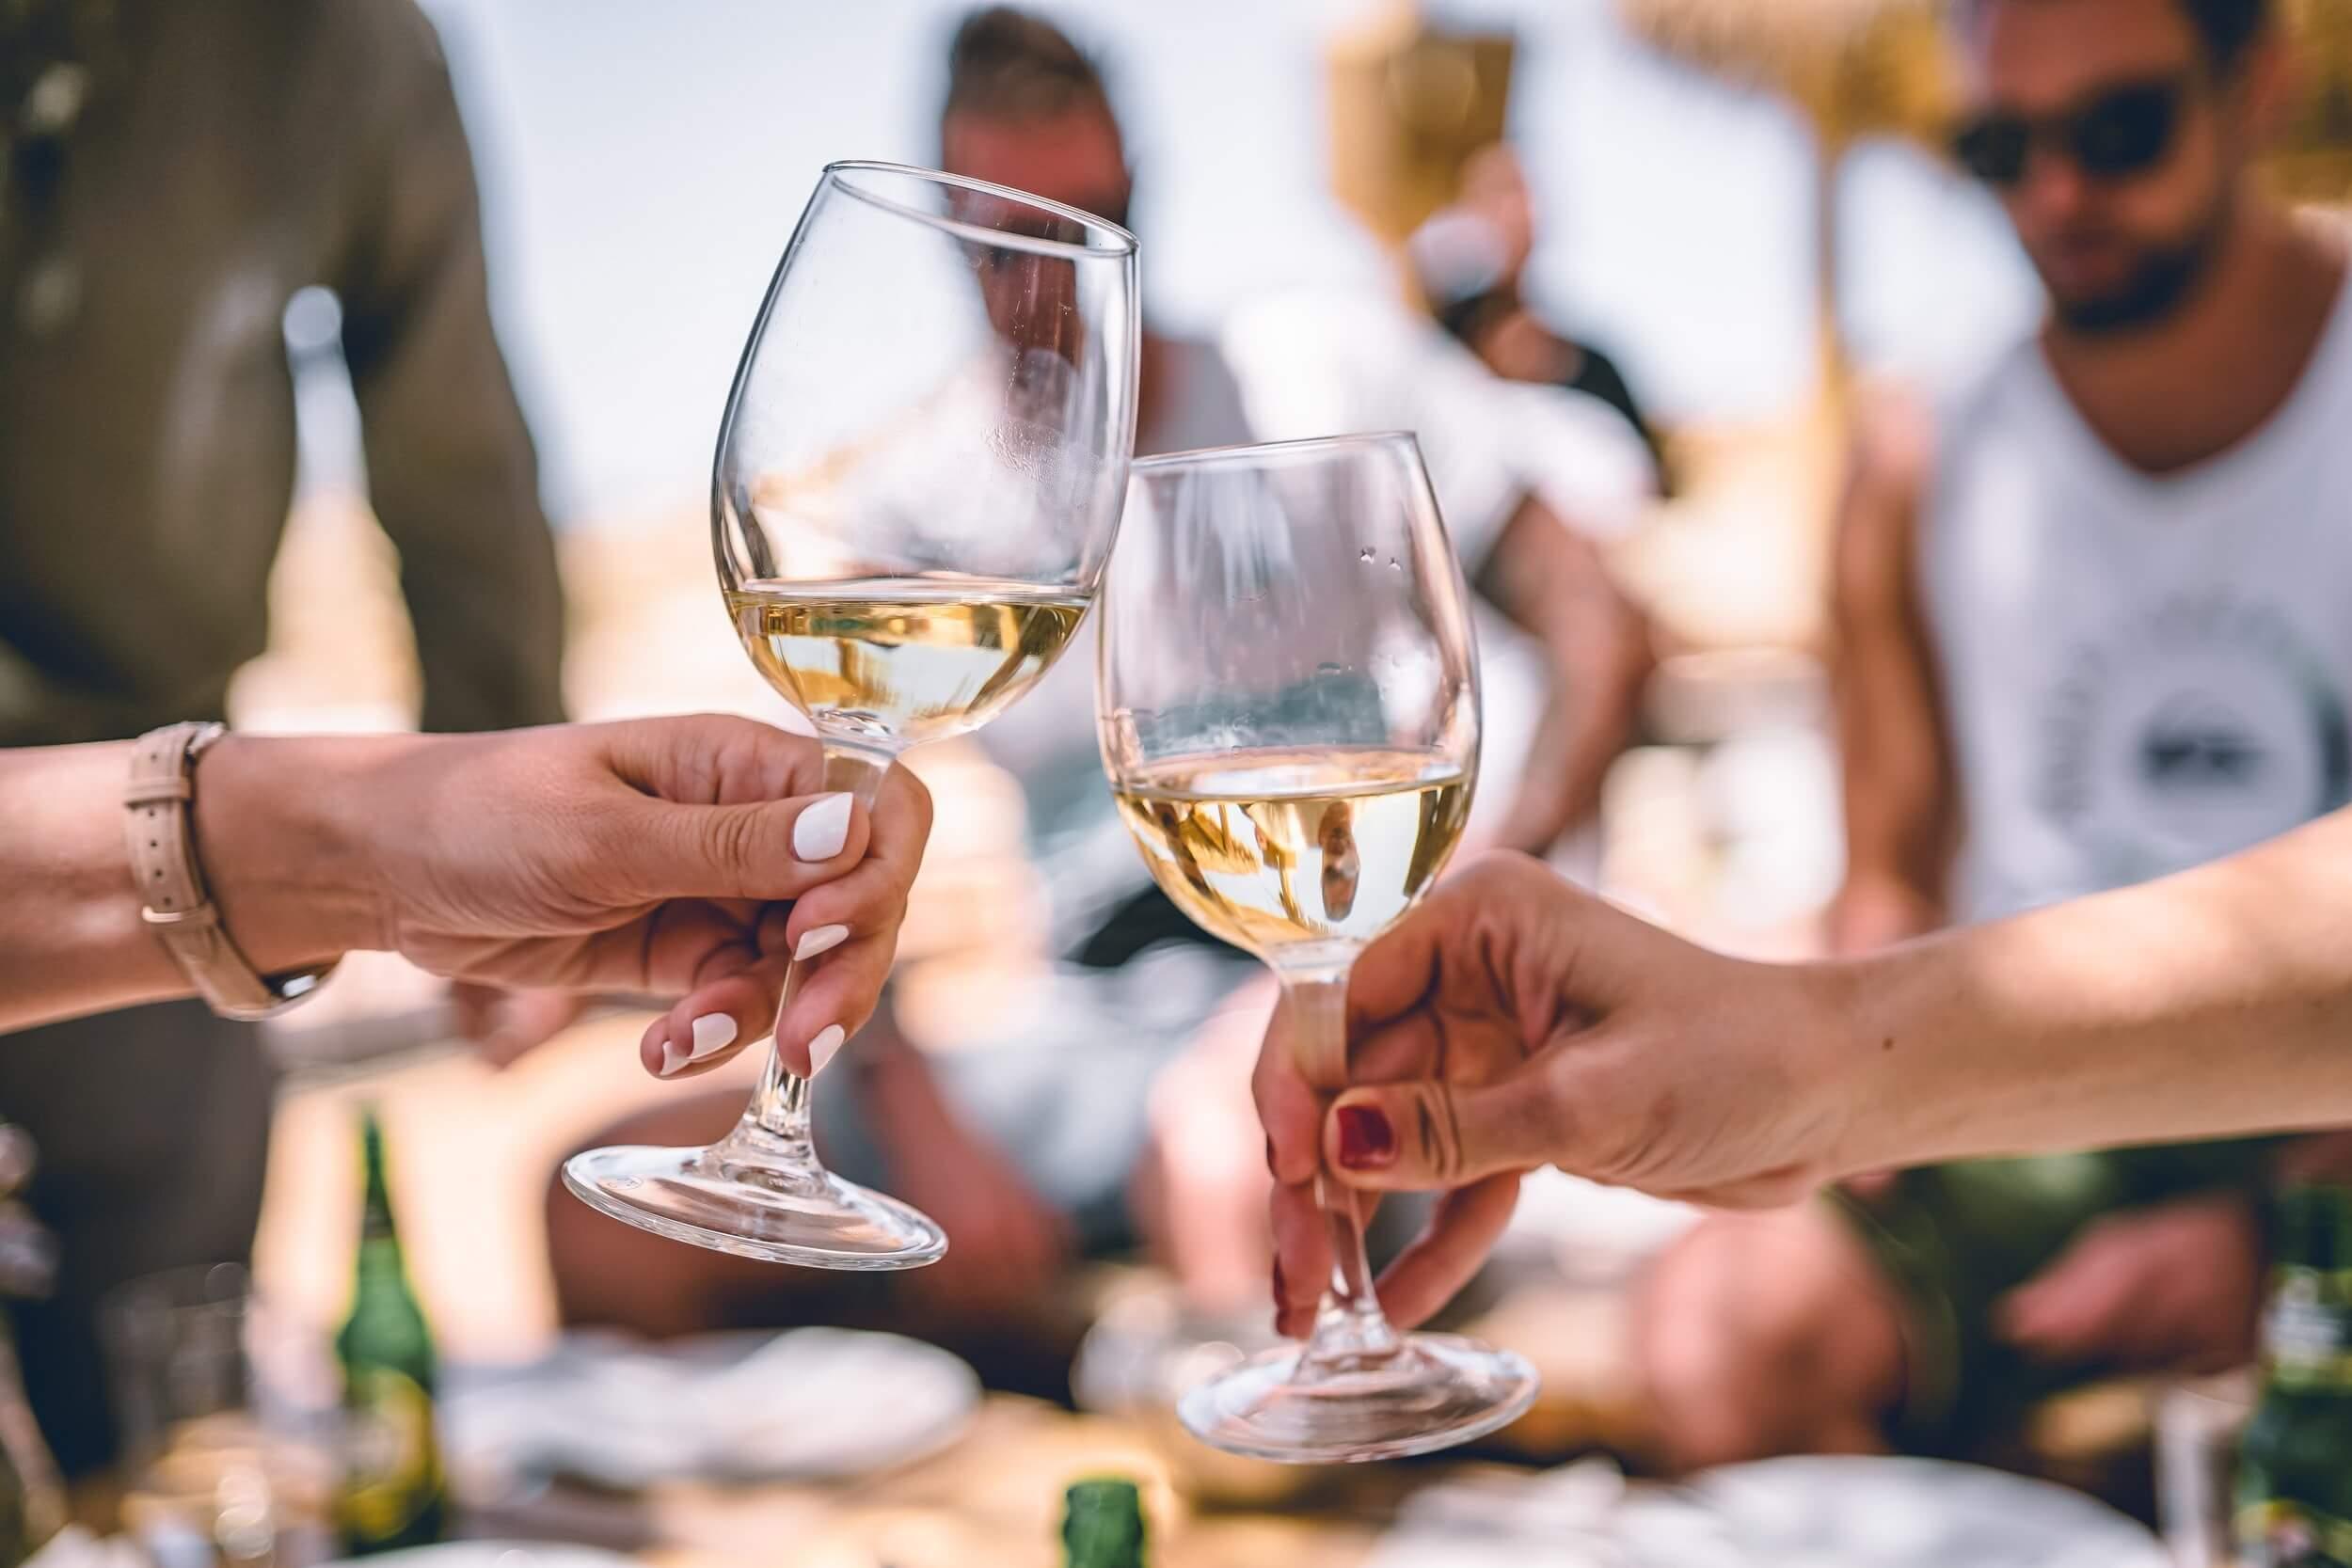 Dentist Wagga FAQ - Is Alcohol Bad For My Teeth  on Morgan Street Dental Centre - Wine Glass on a Toast